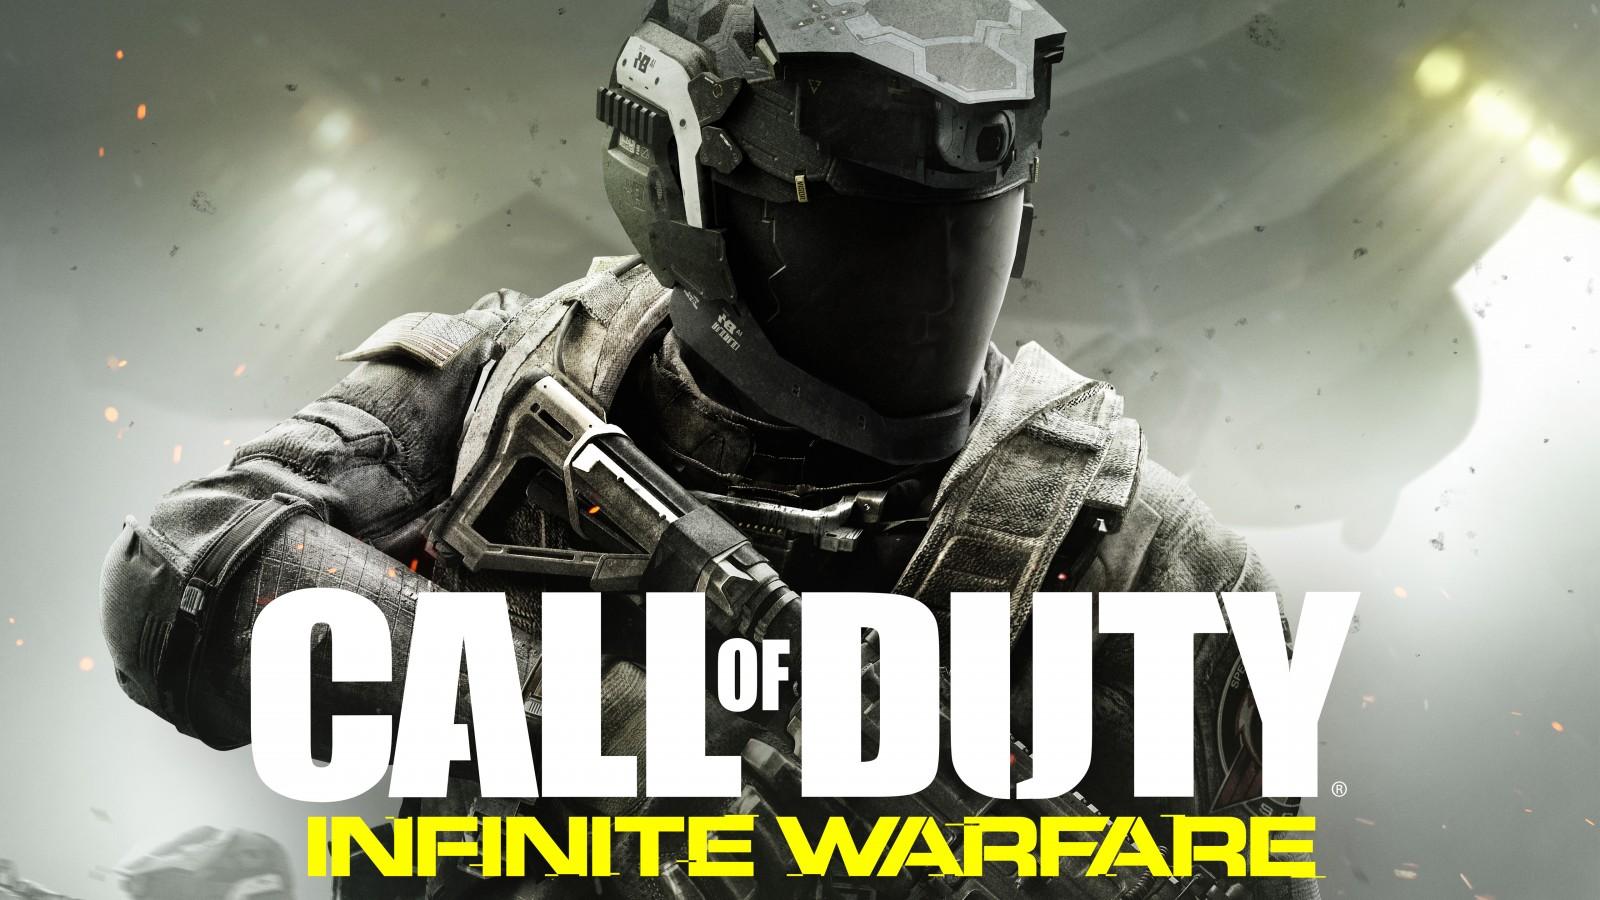 God Wallpaper Download 3d Call Of Duty Infinite Warfare Game Wallpapers Hd